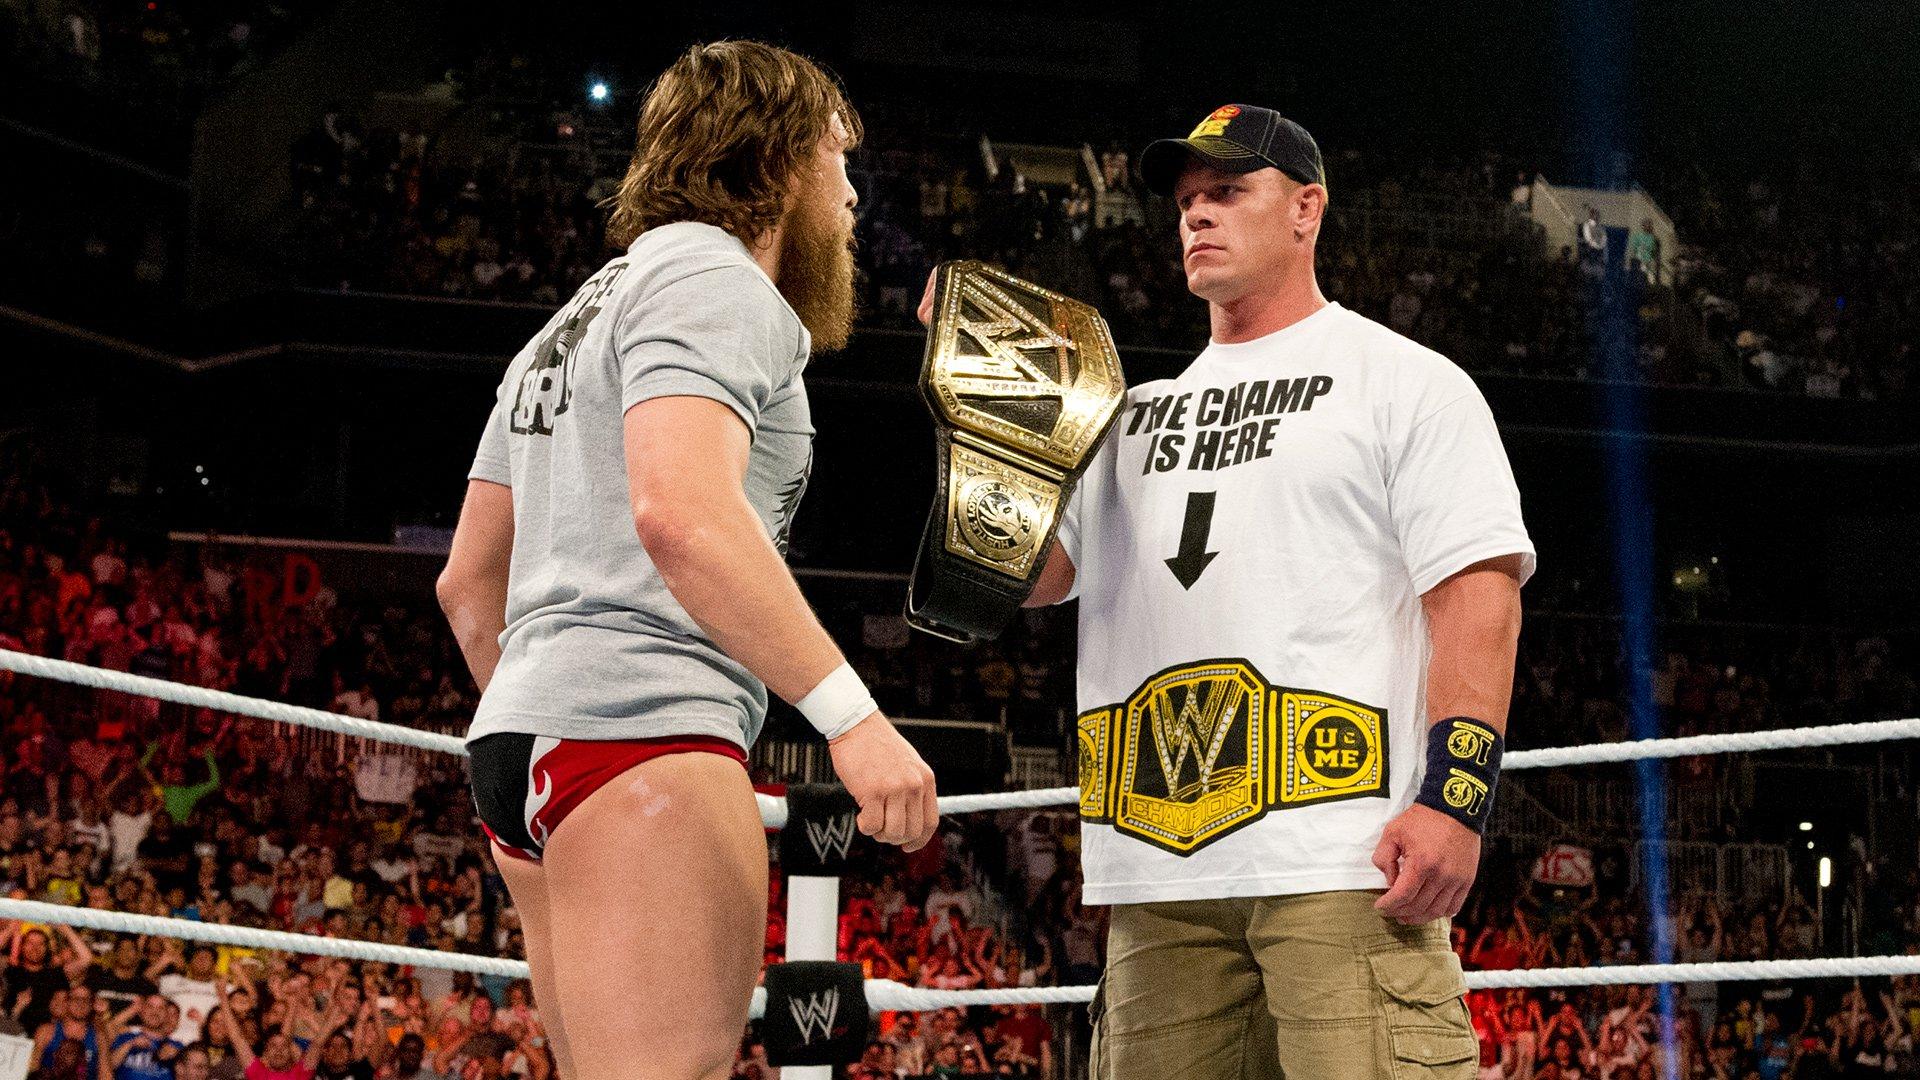 Wwe Champion John Cena Elects To Face Daniel Bryan At Summerslam